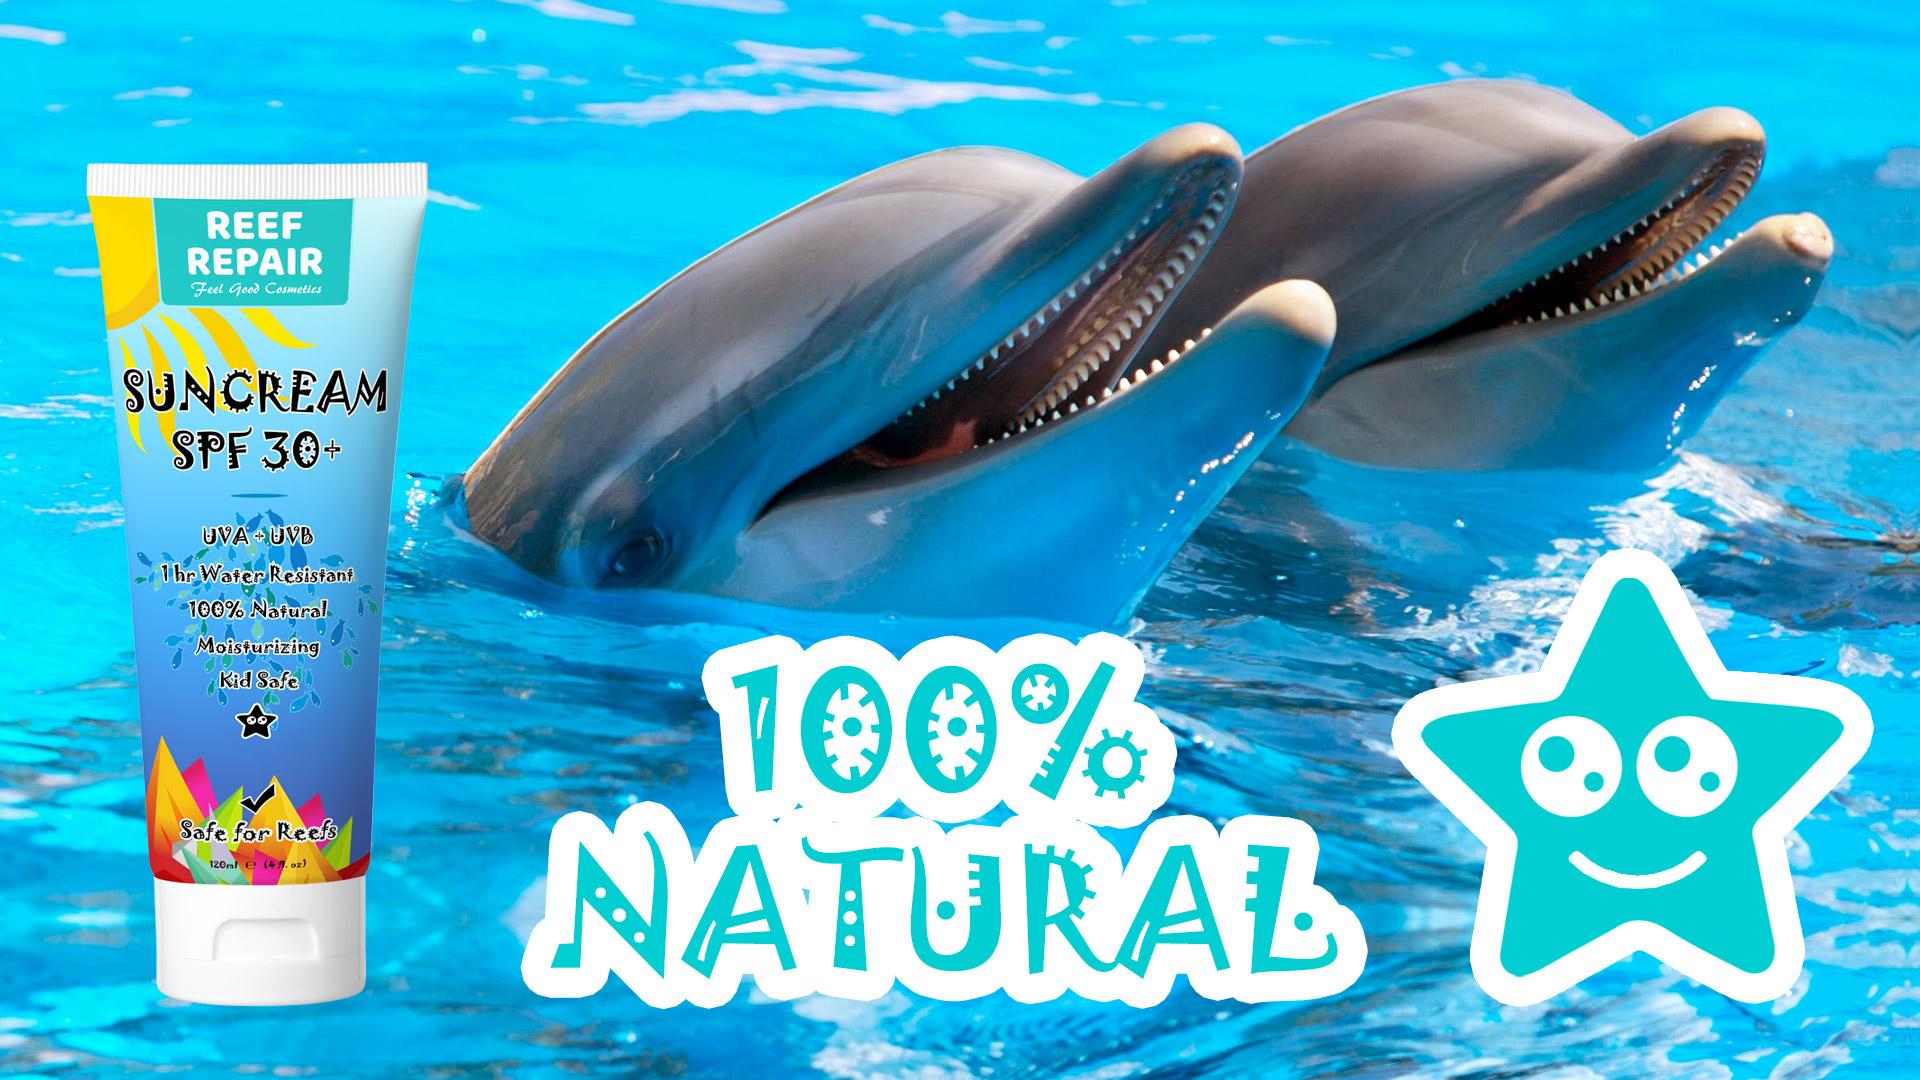 All Natural Coral Reef Safe Sun Cream Sunscreen Spf 30 Reef Repair 120ml